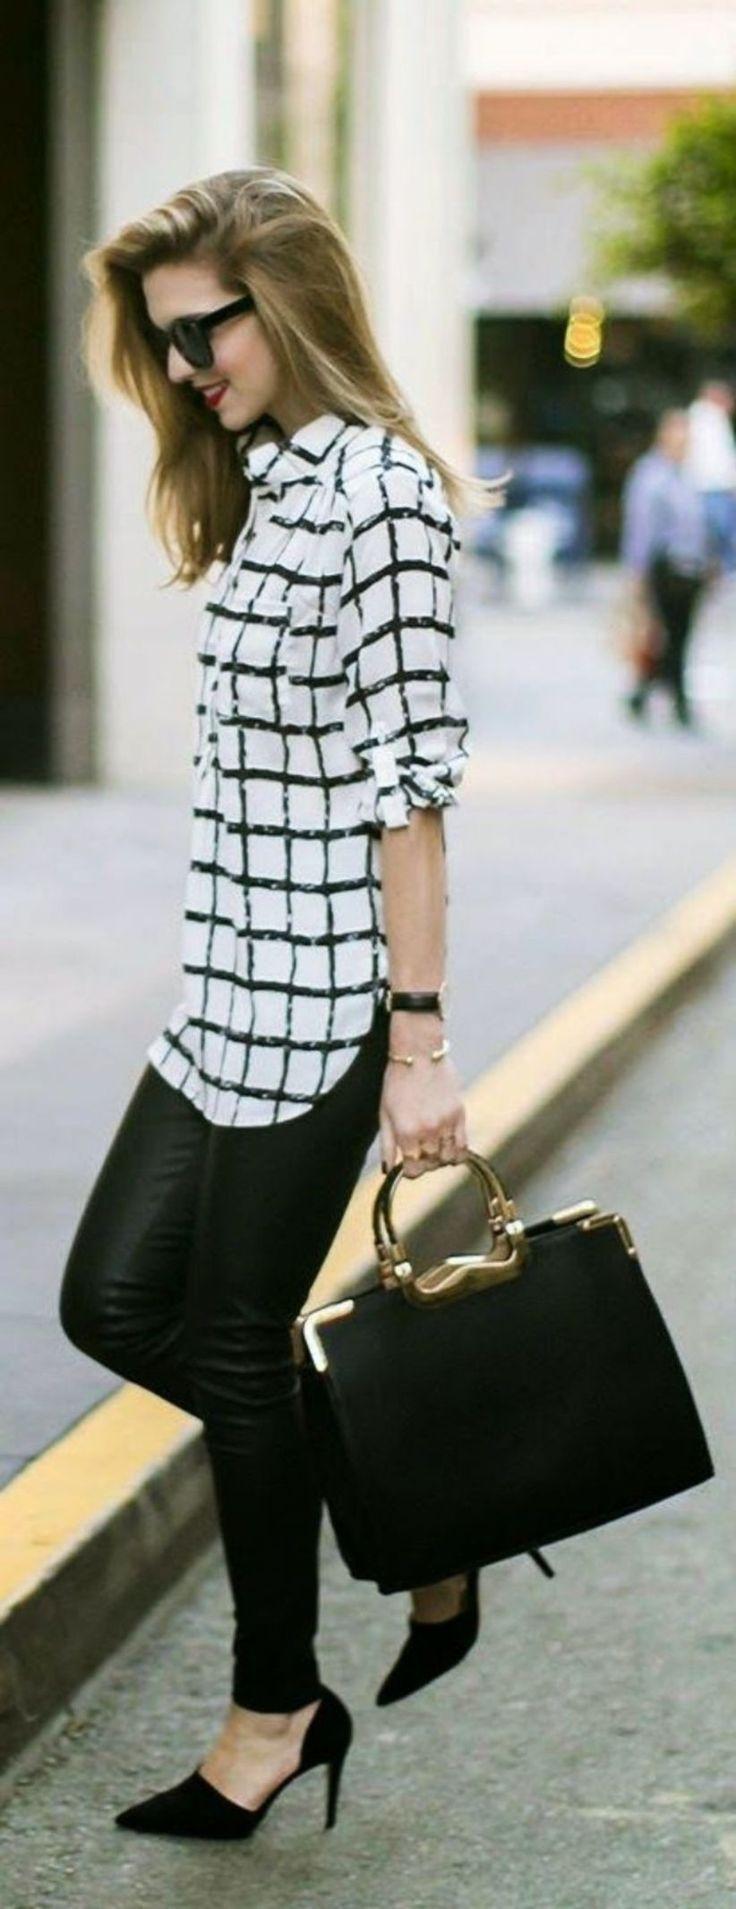 nice 44 Beautiful Tunic Top Outfits for Women http://attirepin.com/2017/12/25/44-beautiful-tunic-top-outfits-women/